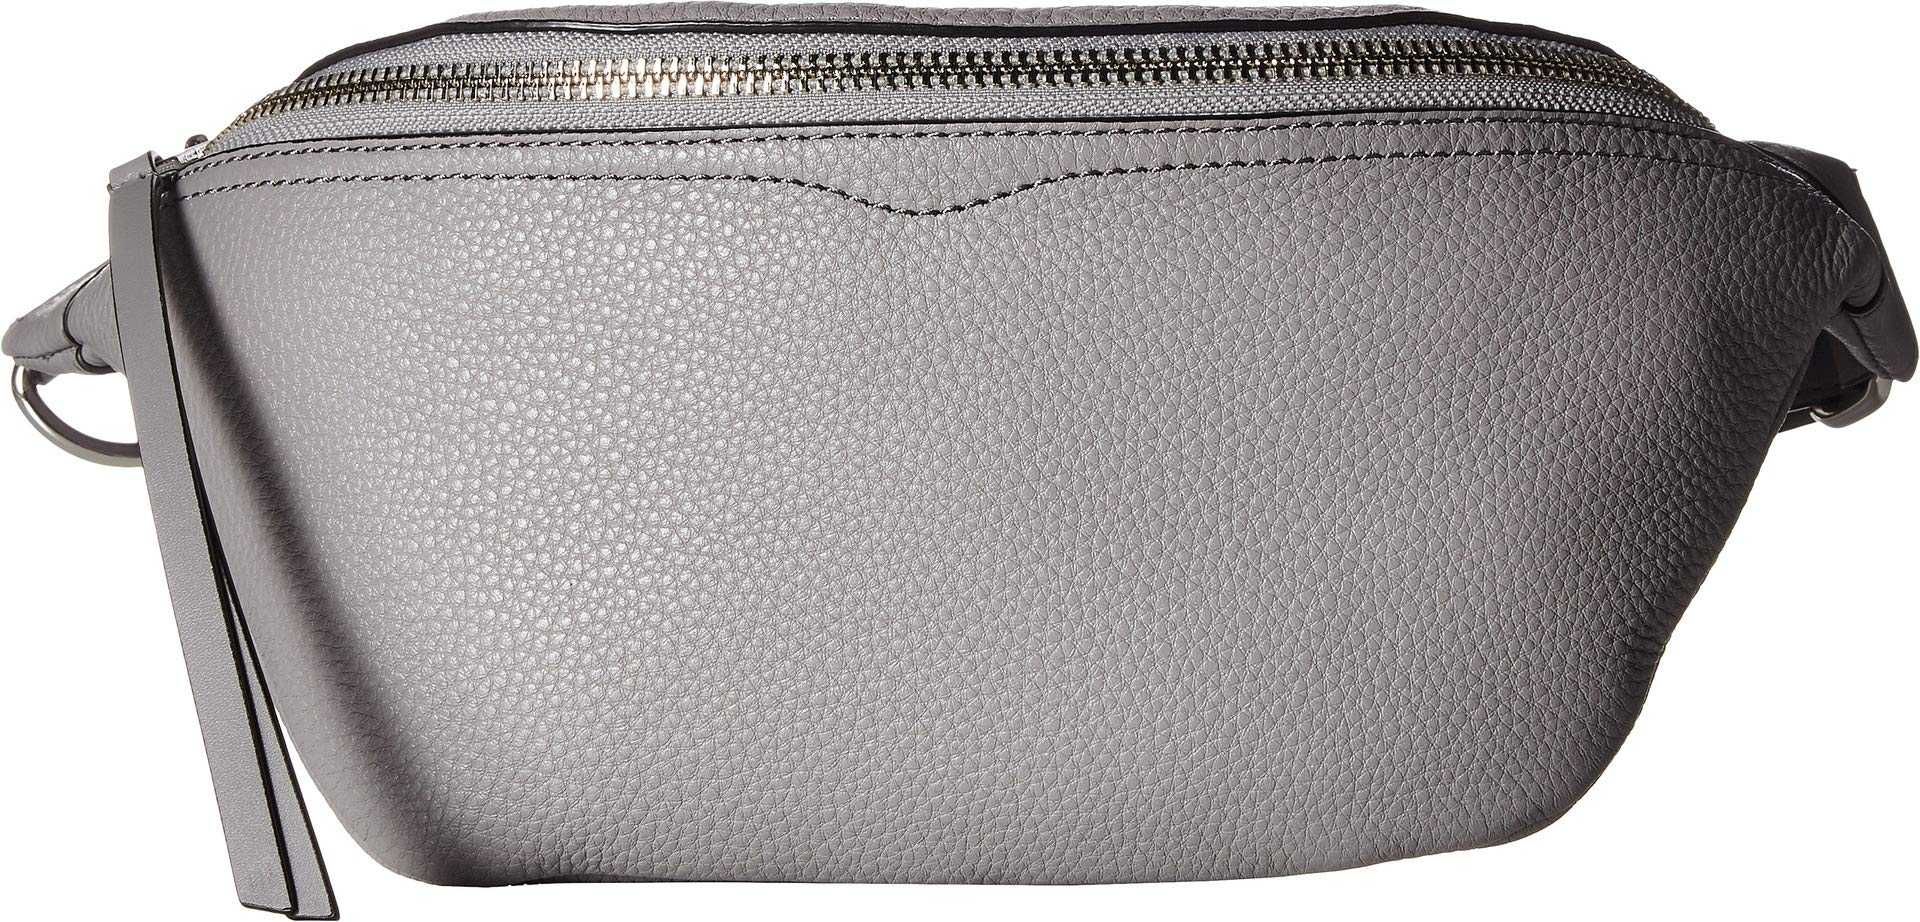 Rebecca Minkoff Women's Bree Belt Bag Grey One Size